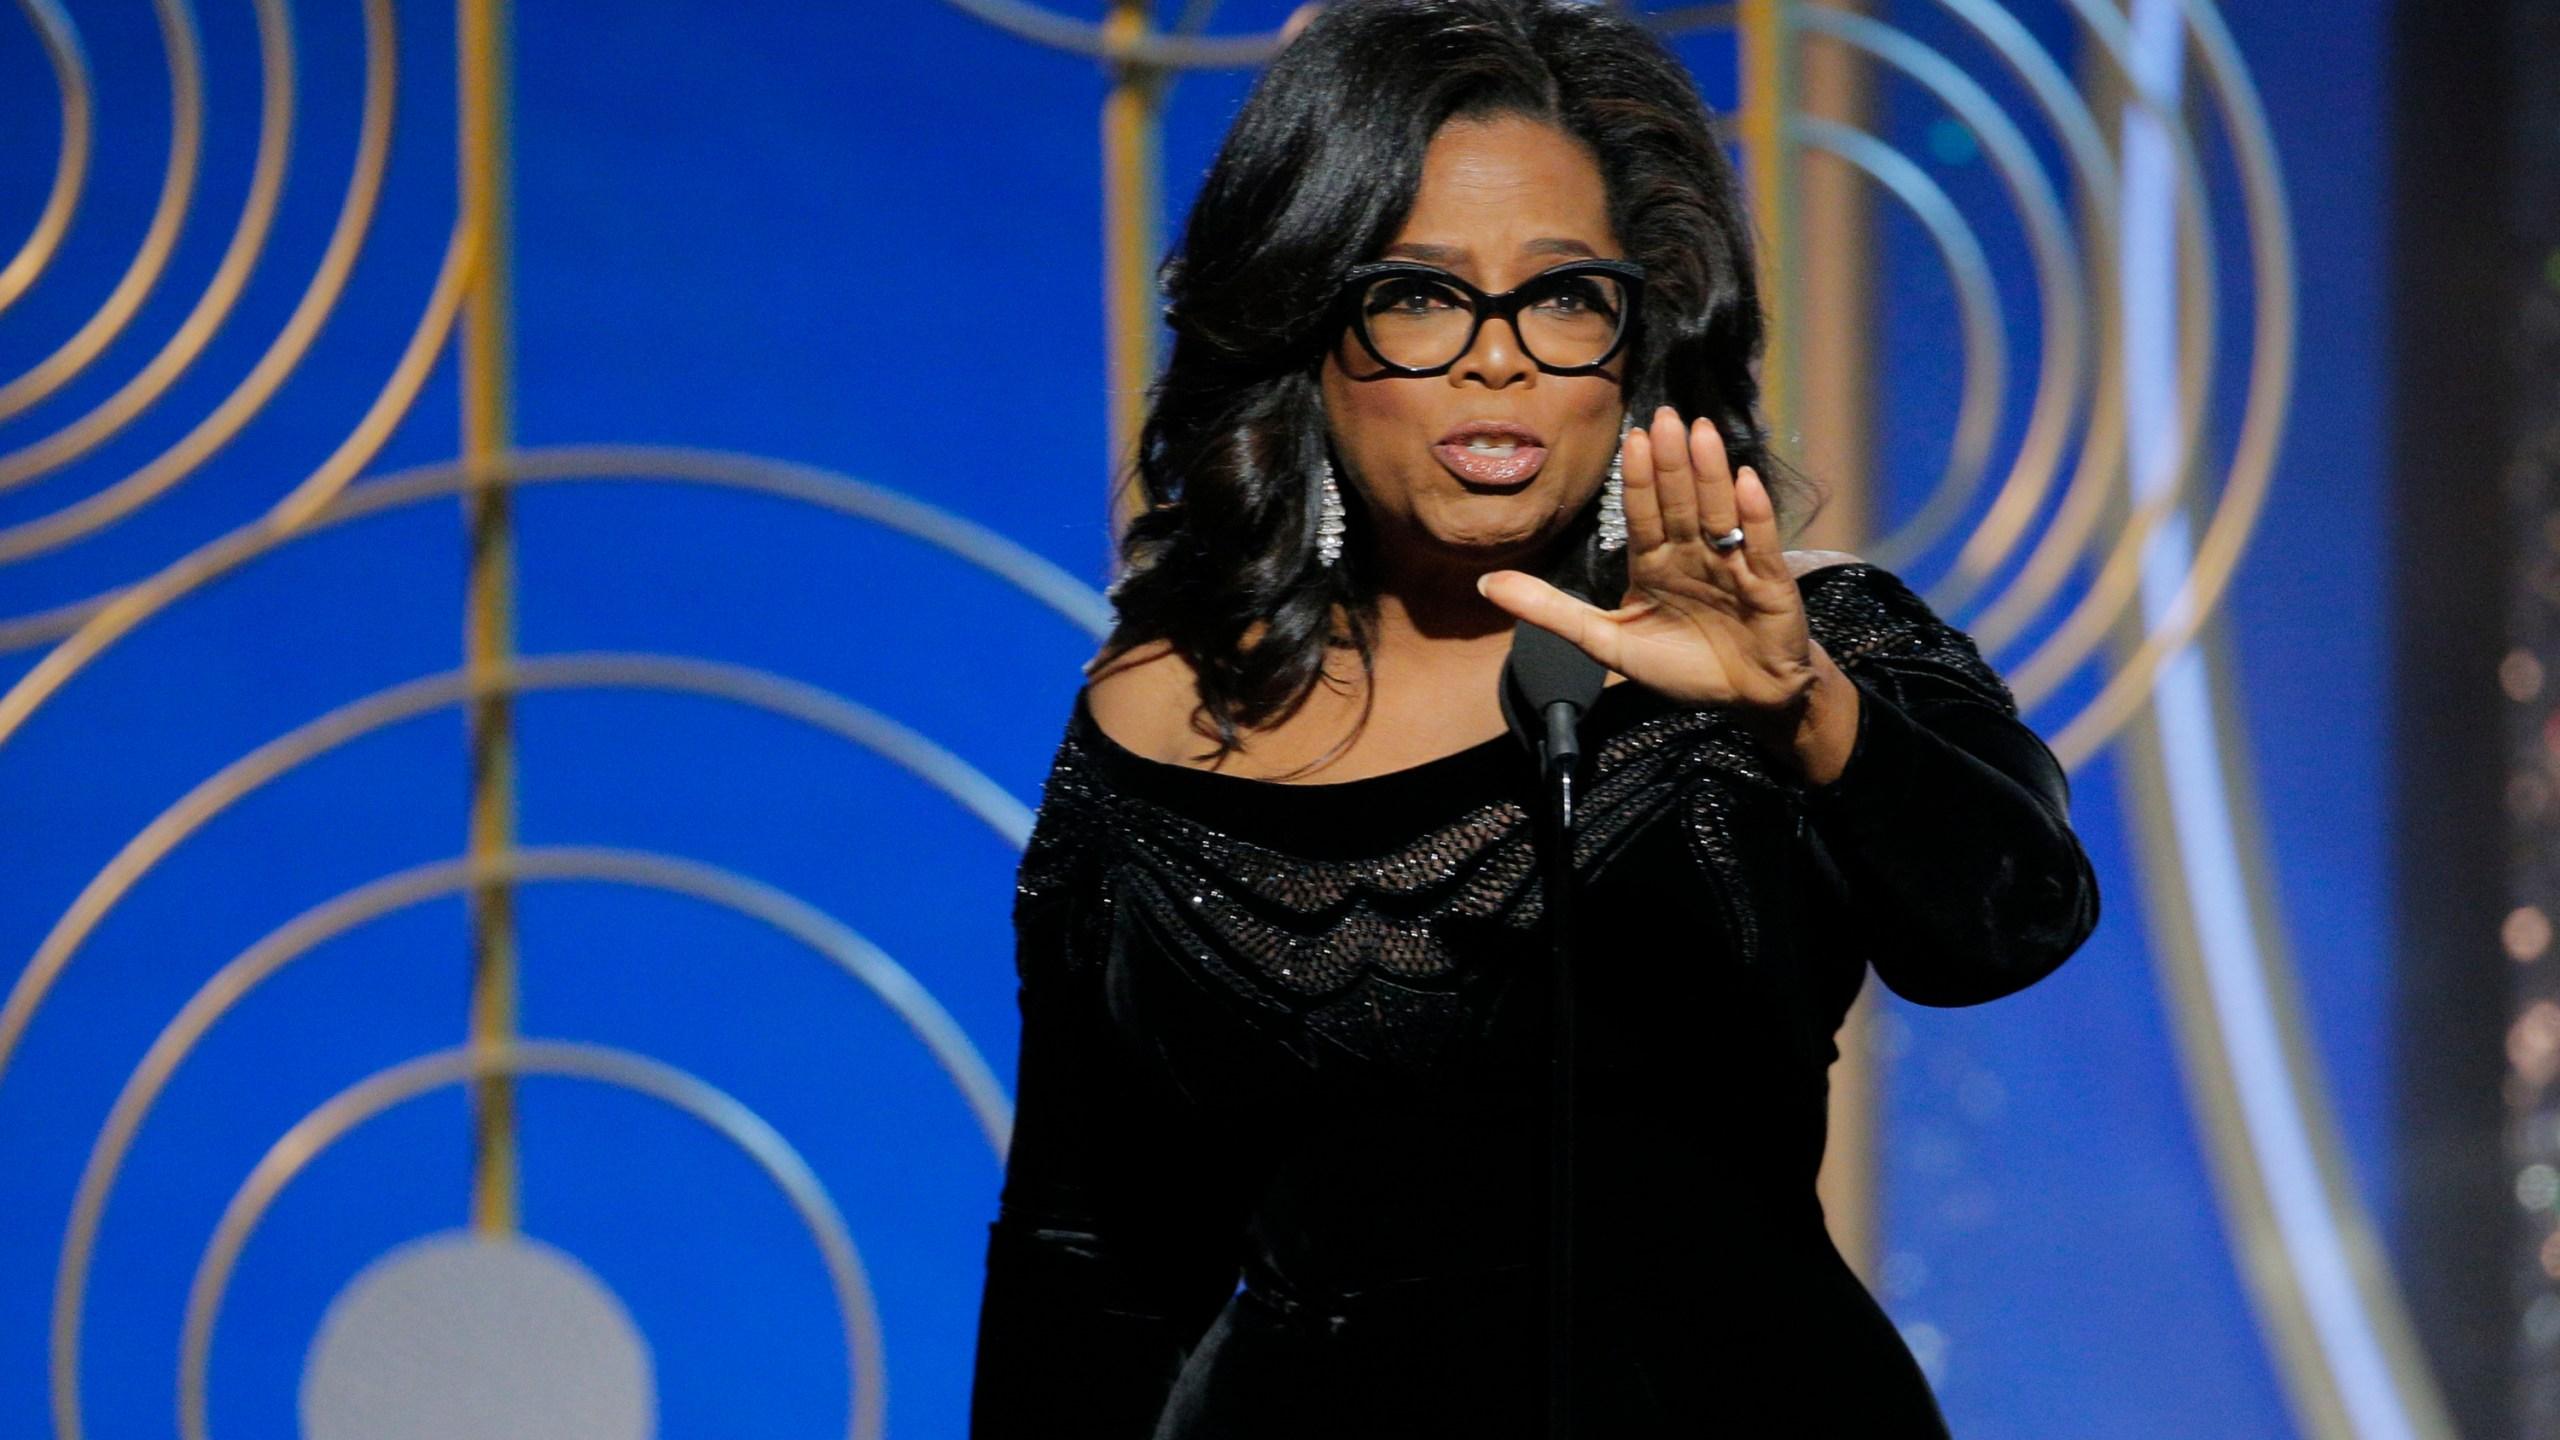 75th Annual Golden Globe Awards - Show_609899